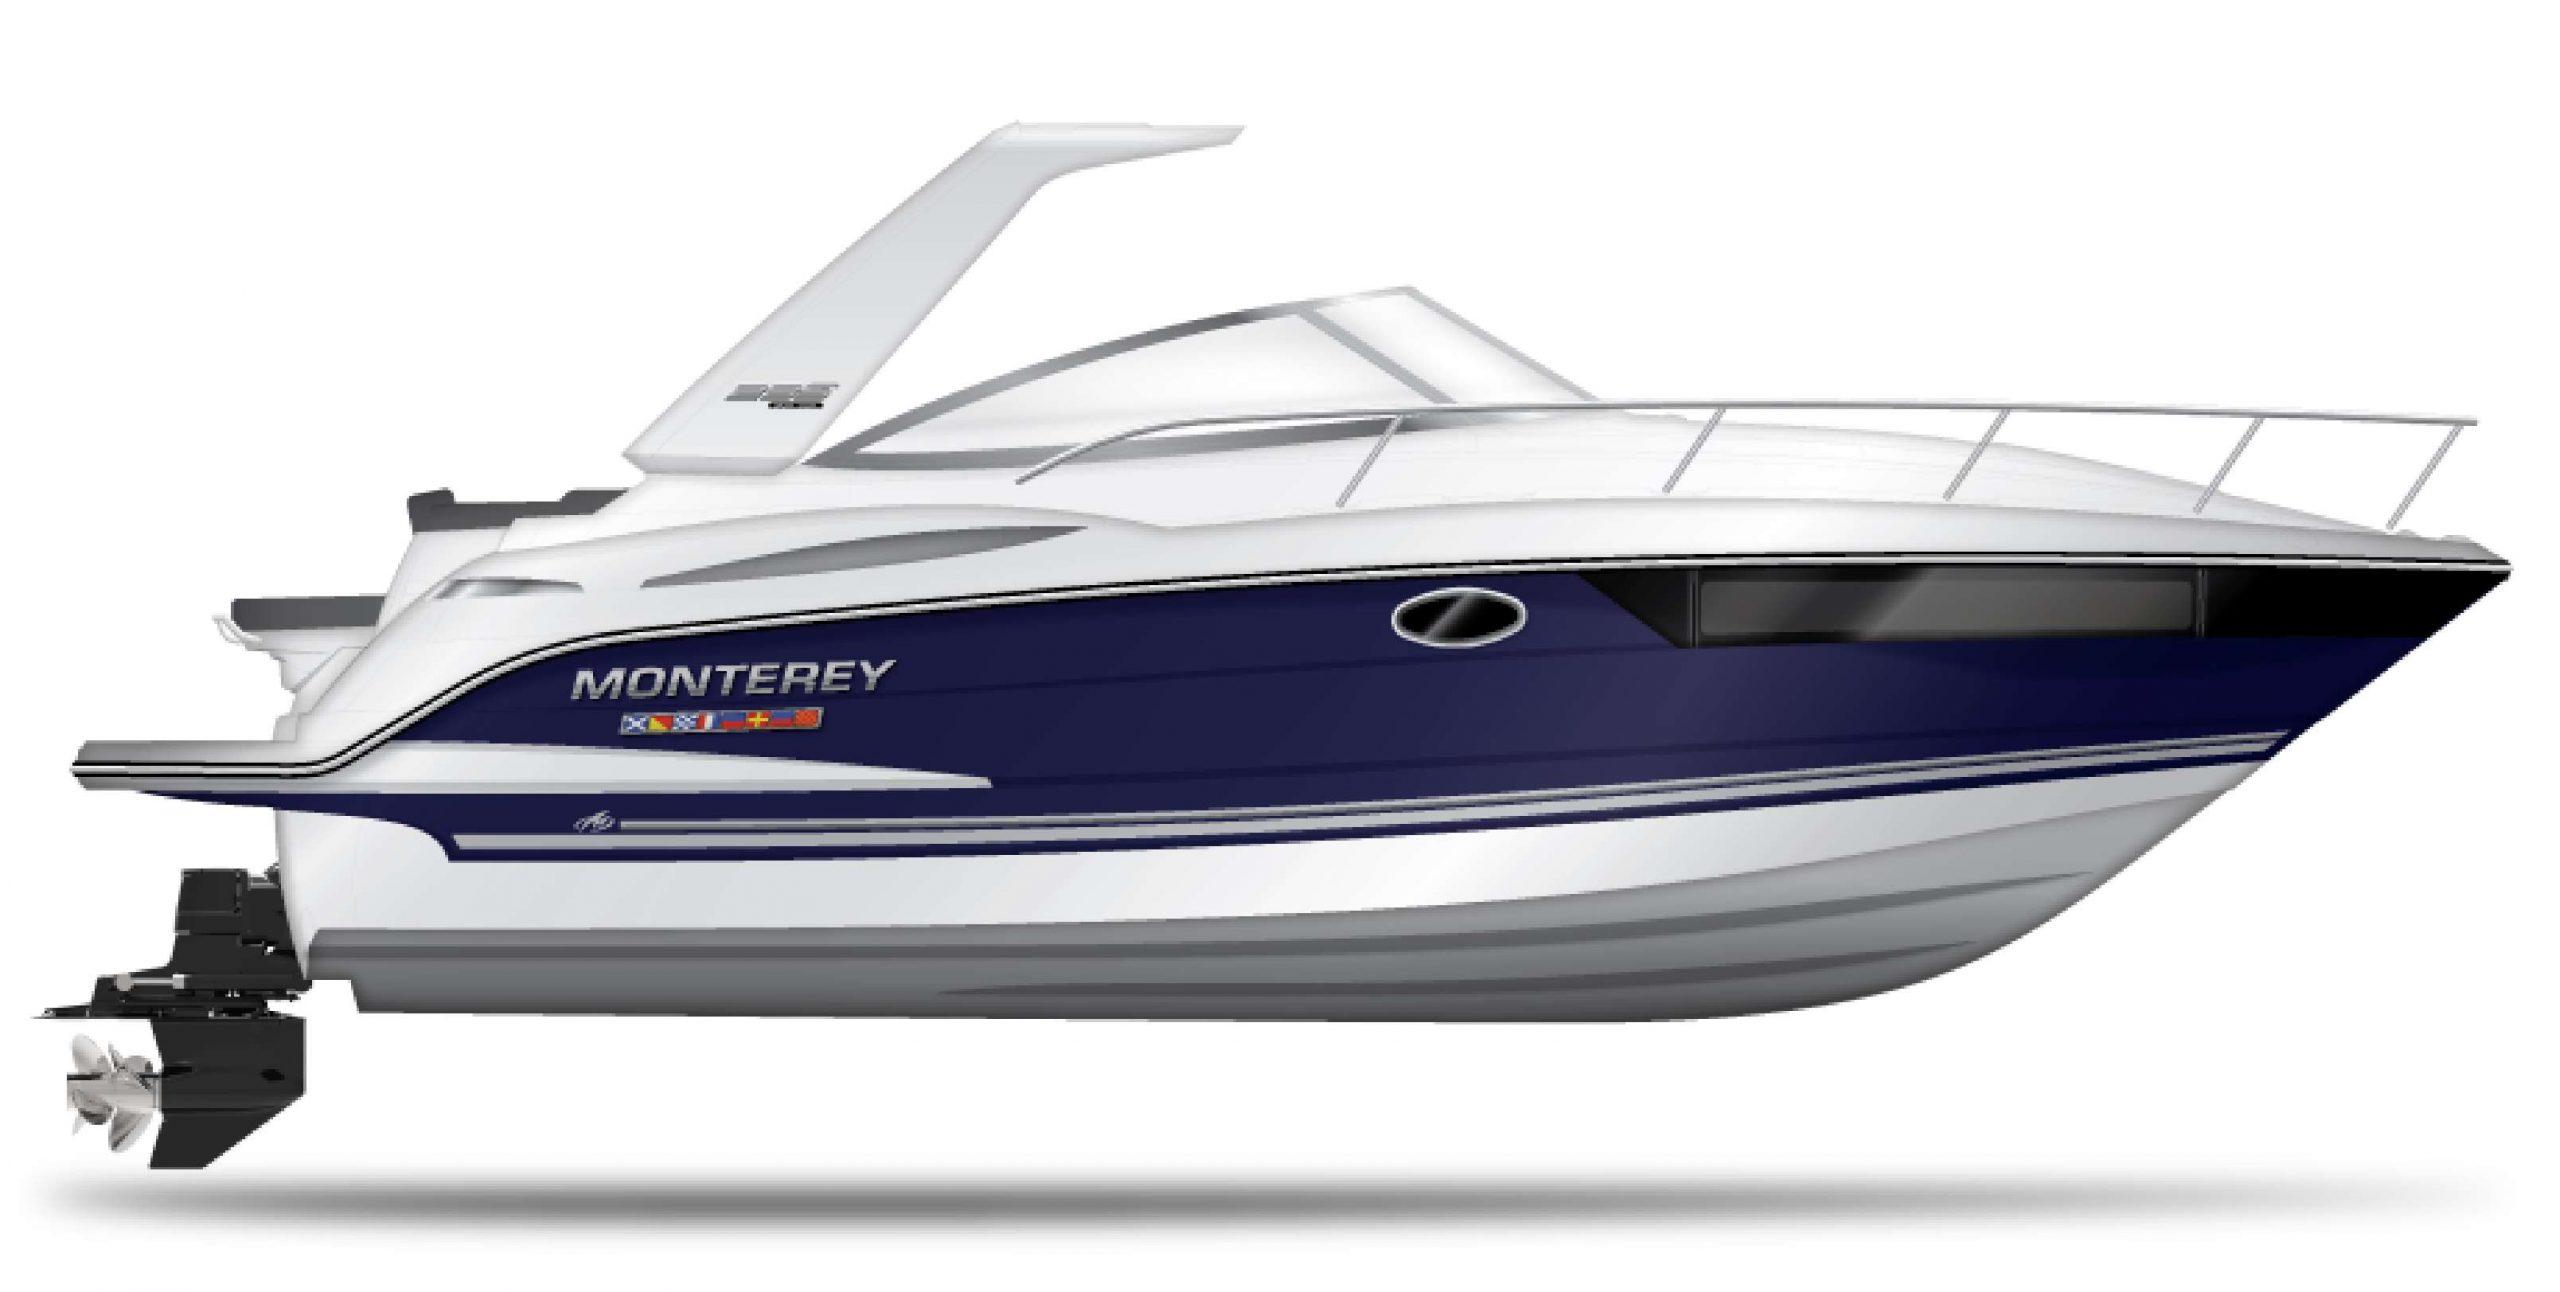 Monterey 295ss - sapphire